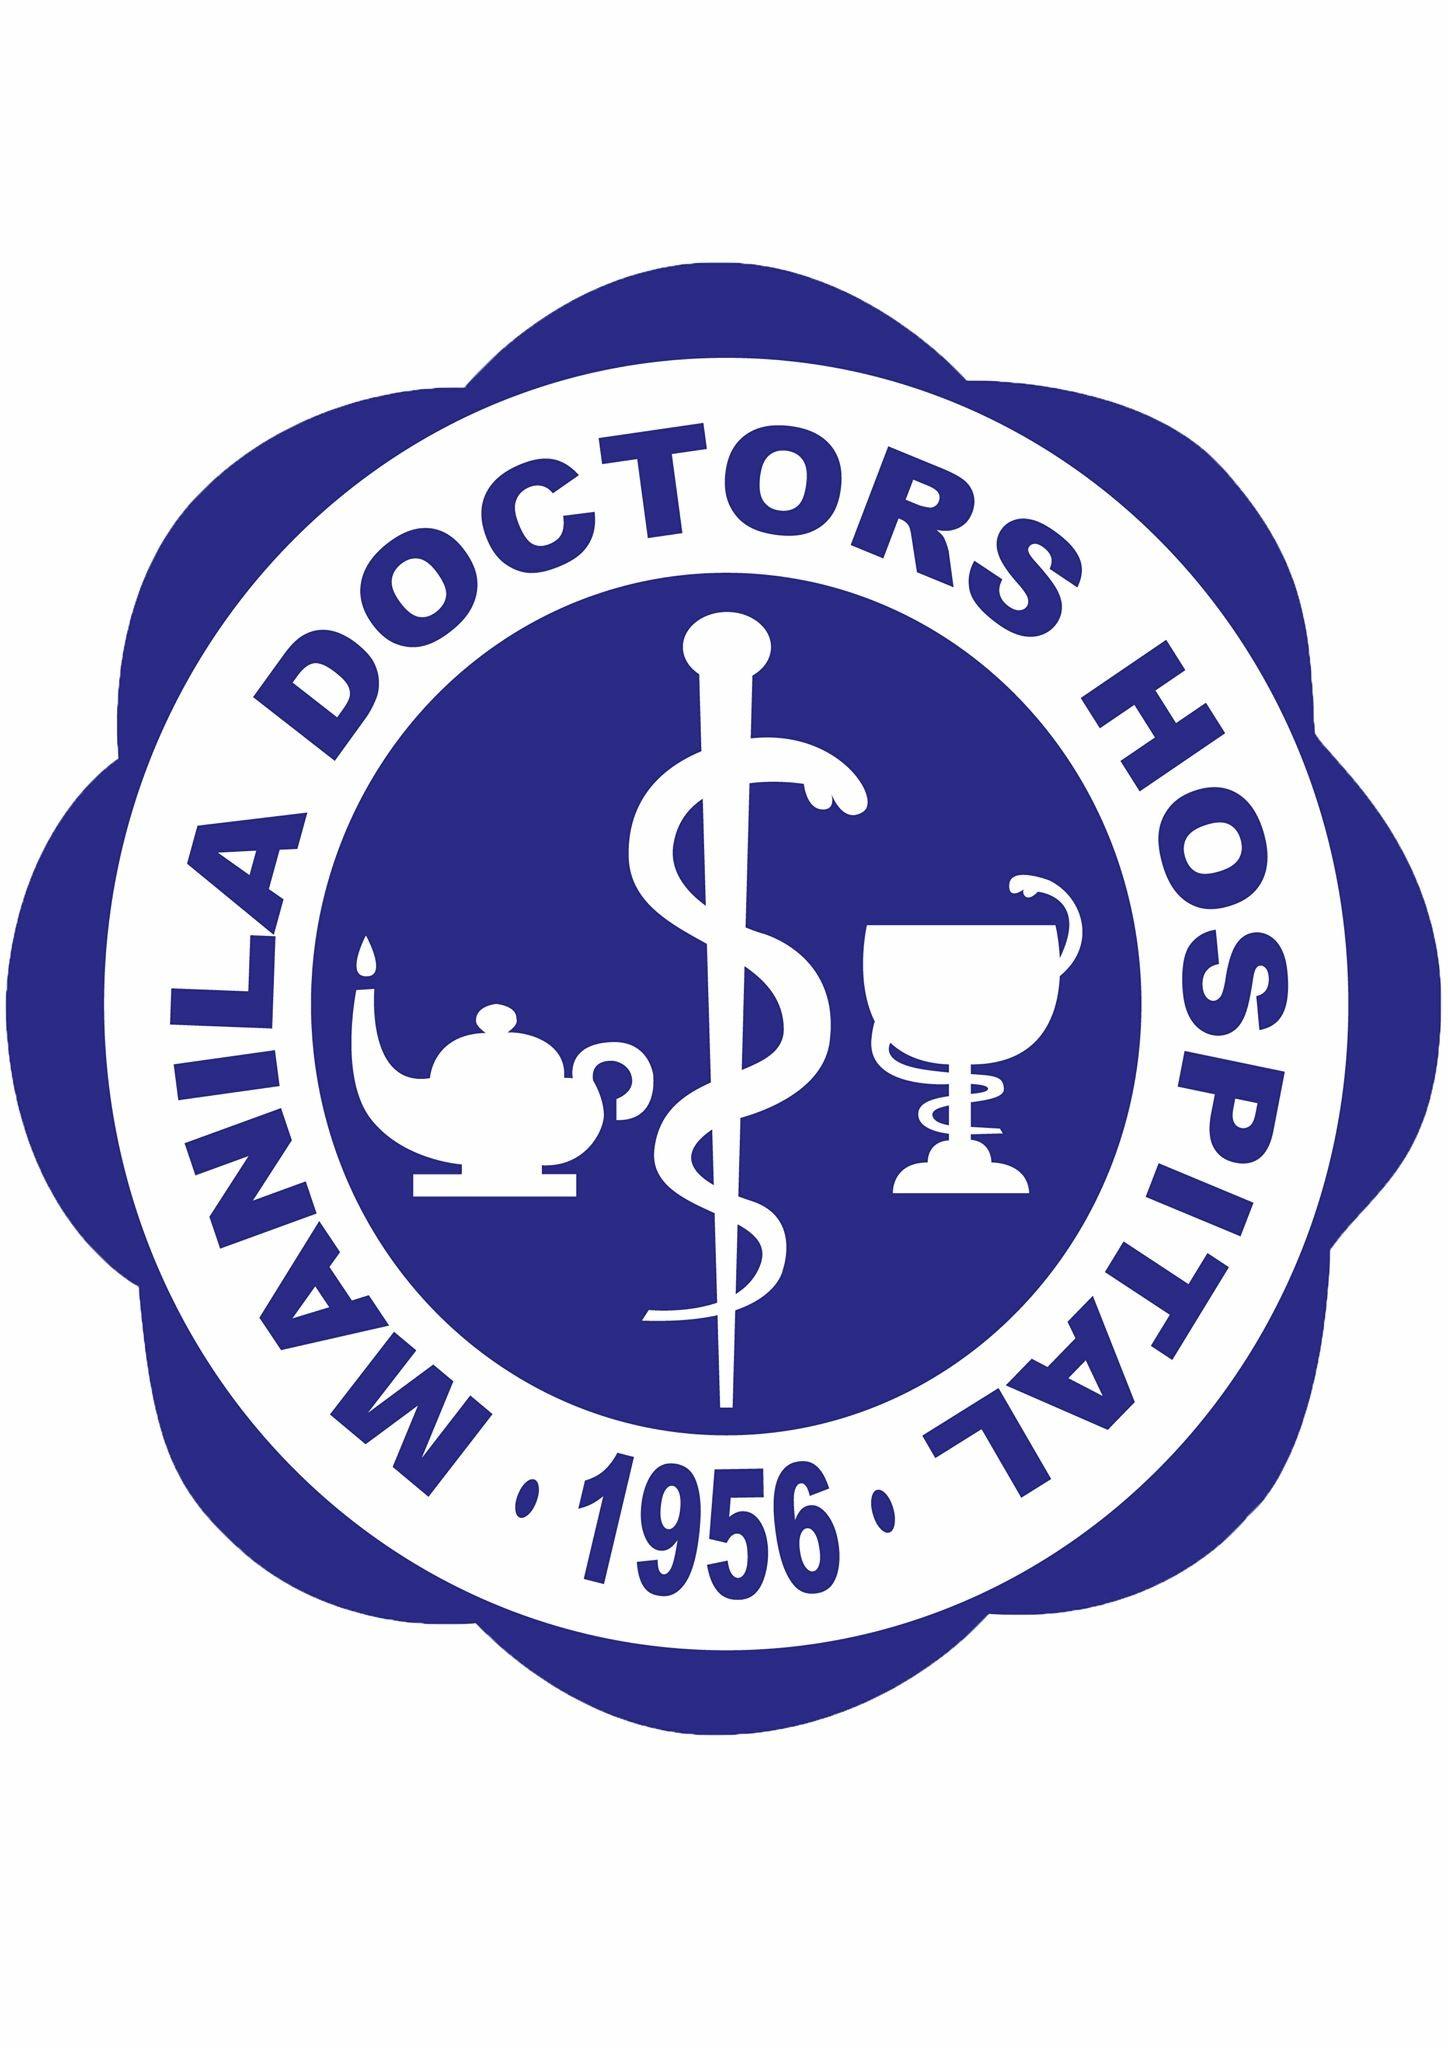 Manila Doctors Hospital - Room No. 226